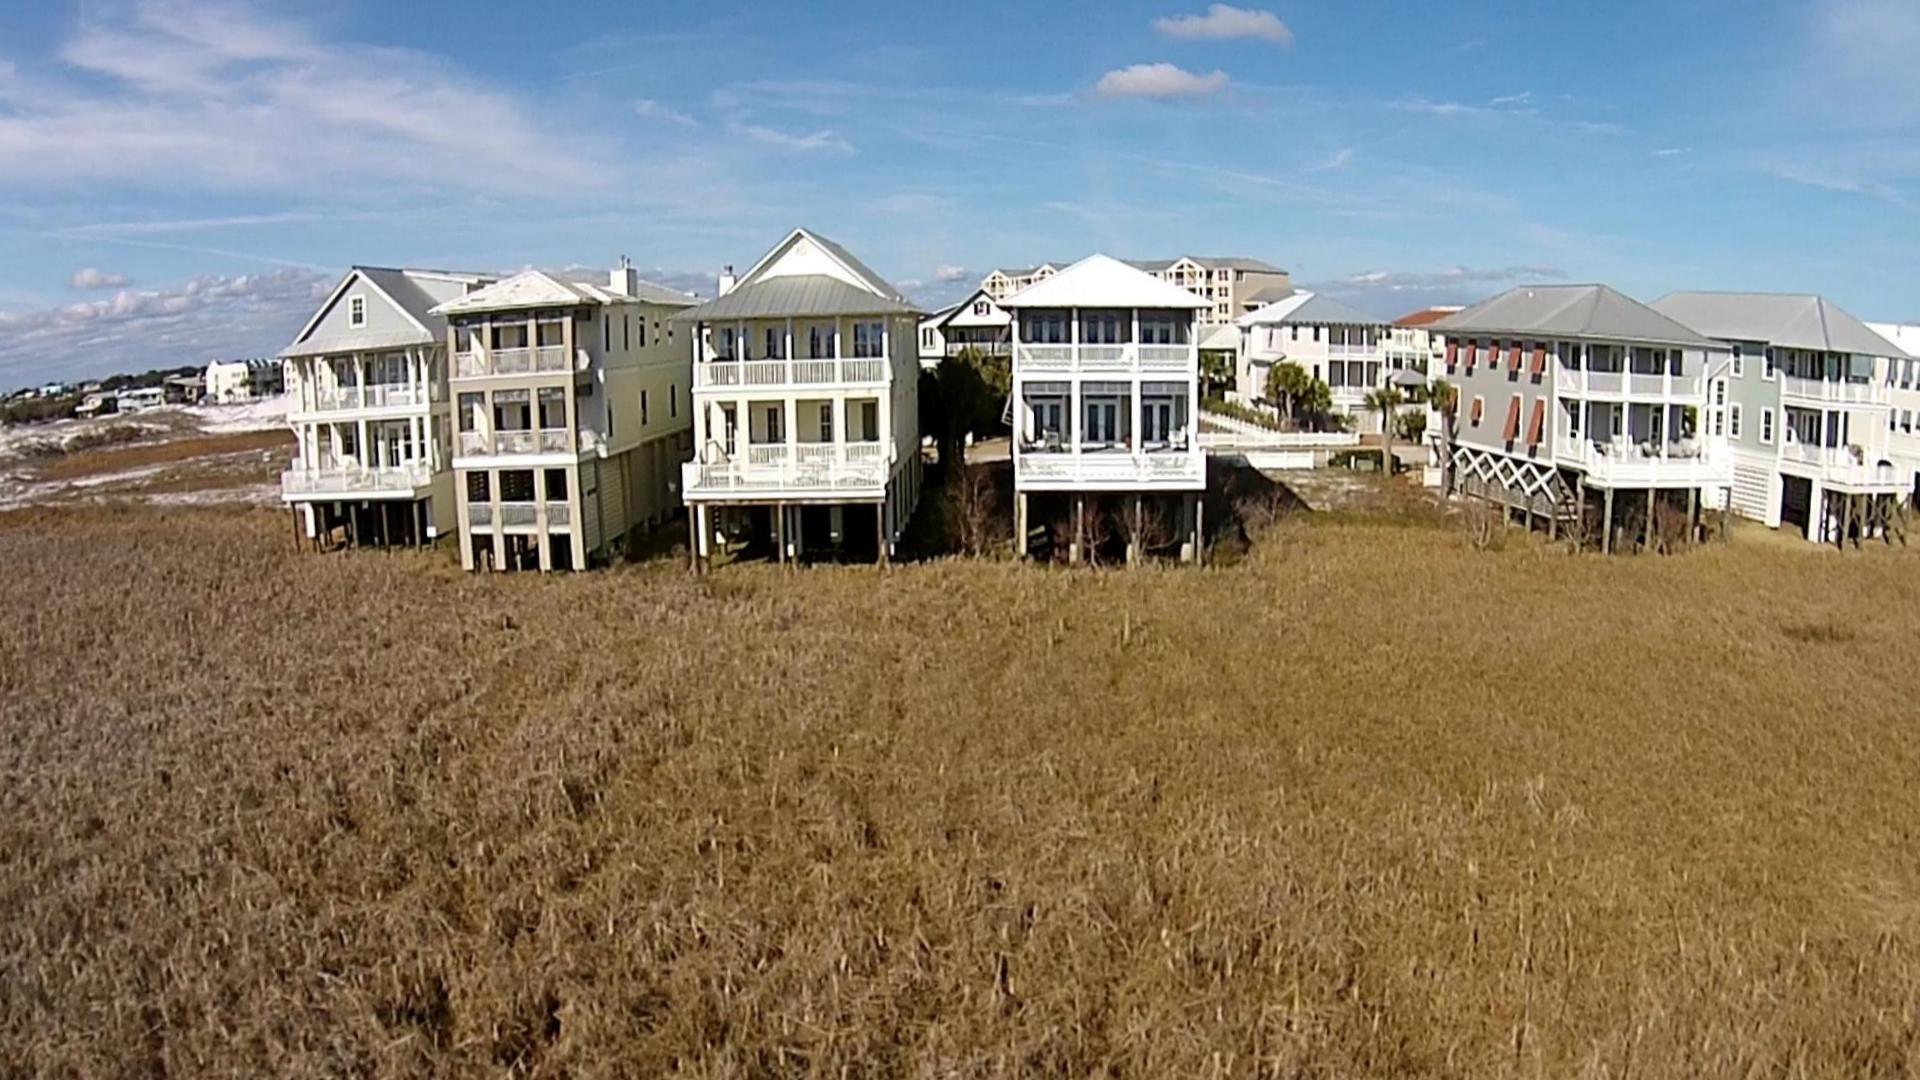 Destin pointe destin florida real estate houses